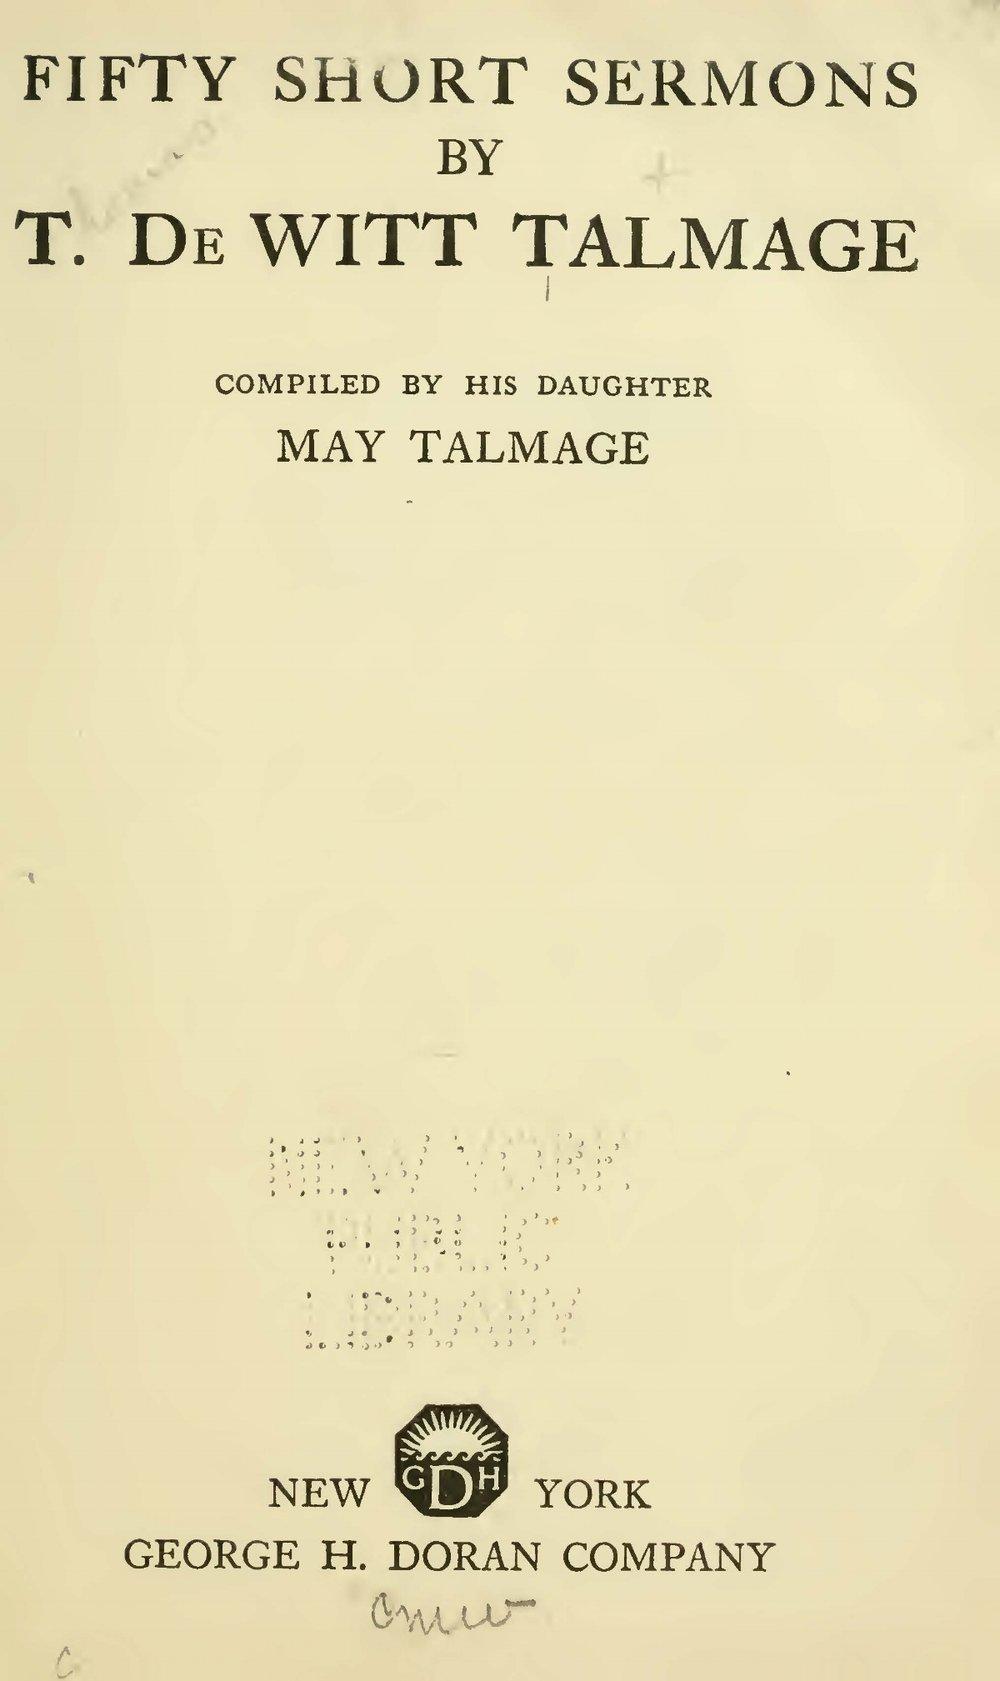 Talmage, Thomas De Witt, Fifty Short Sermons Title Page.jpg